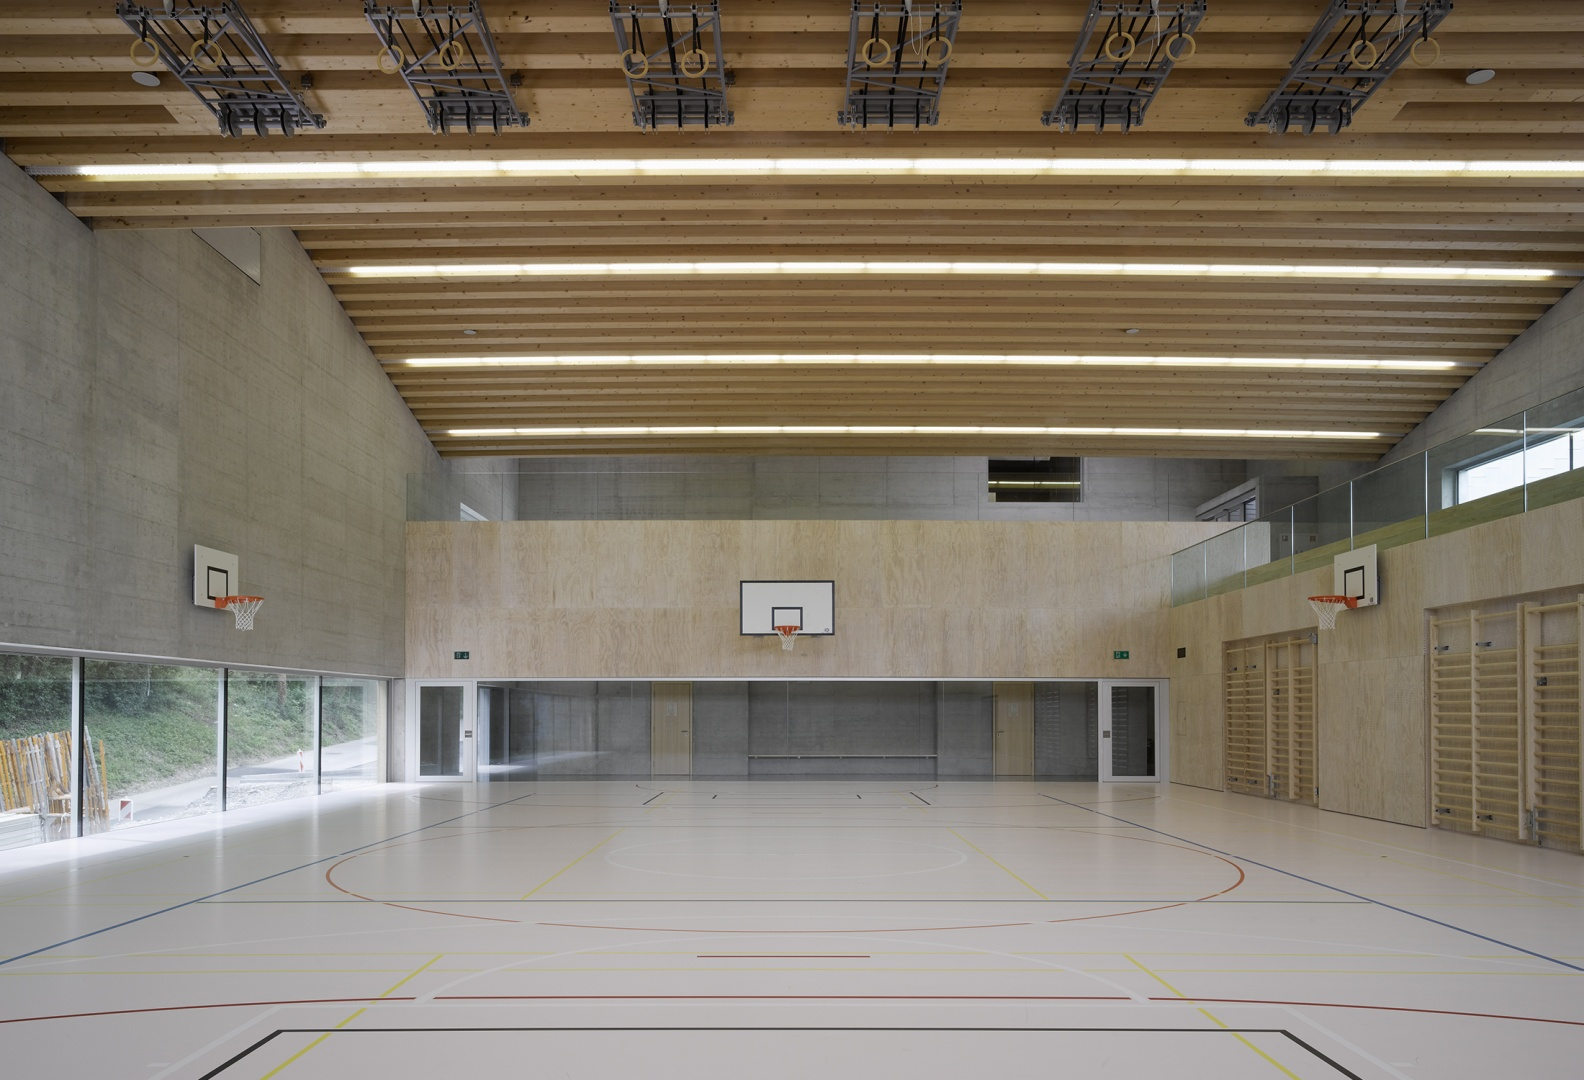 Salle de gym © foto: Dominique Uldry, Bern